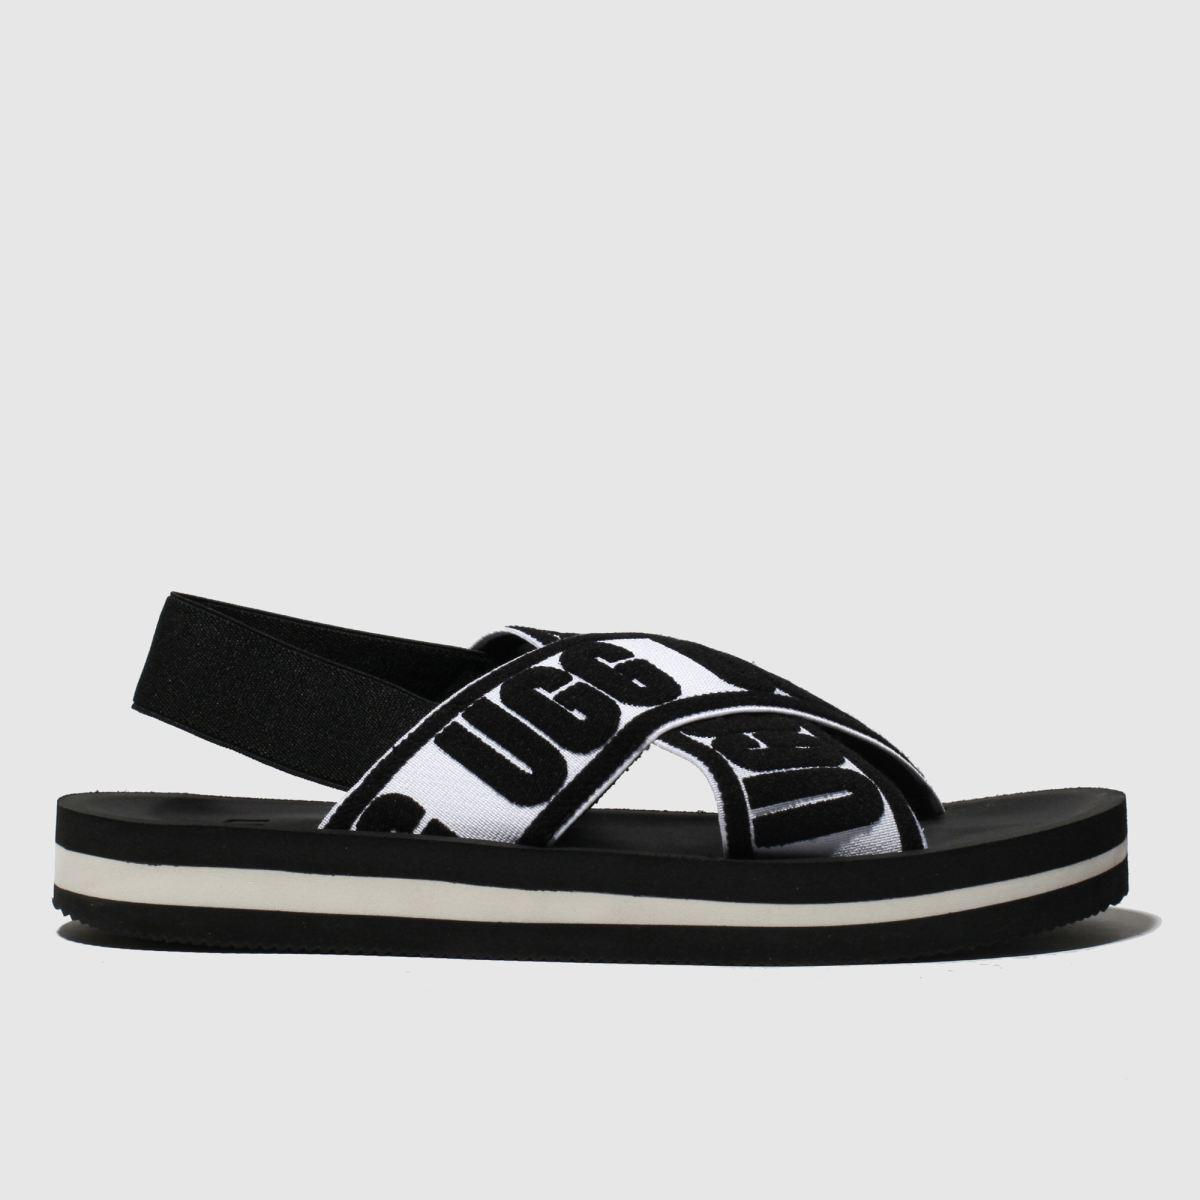 Ugg Black & White Marmont Graphic Sandals